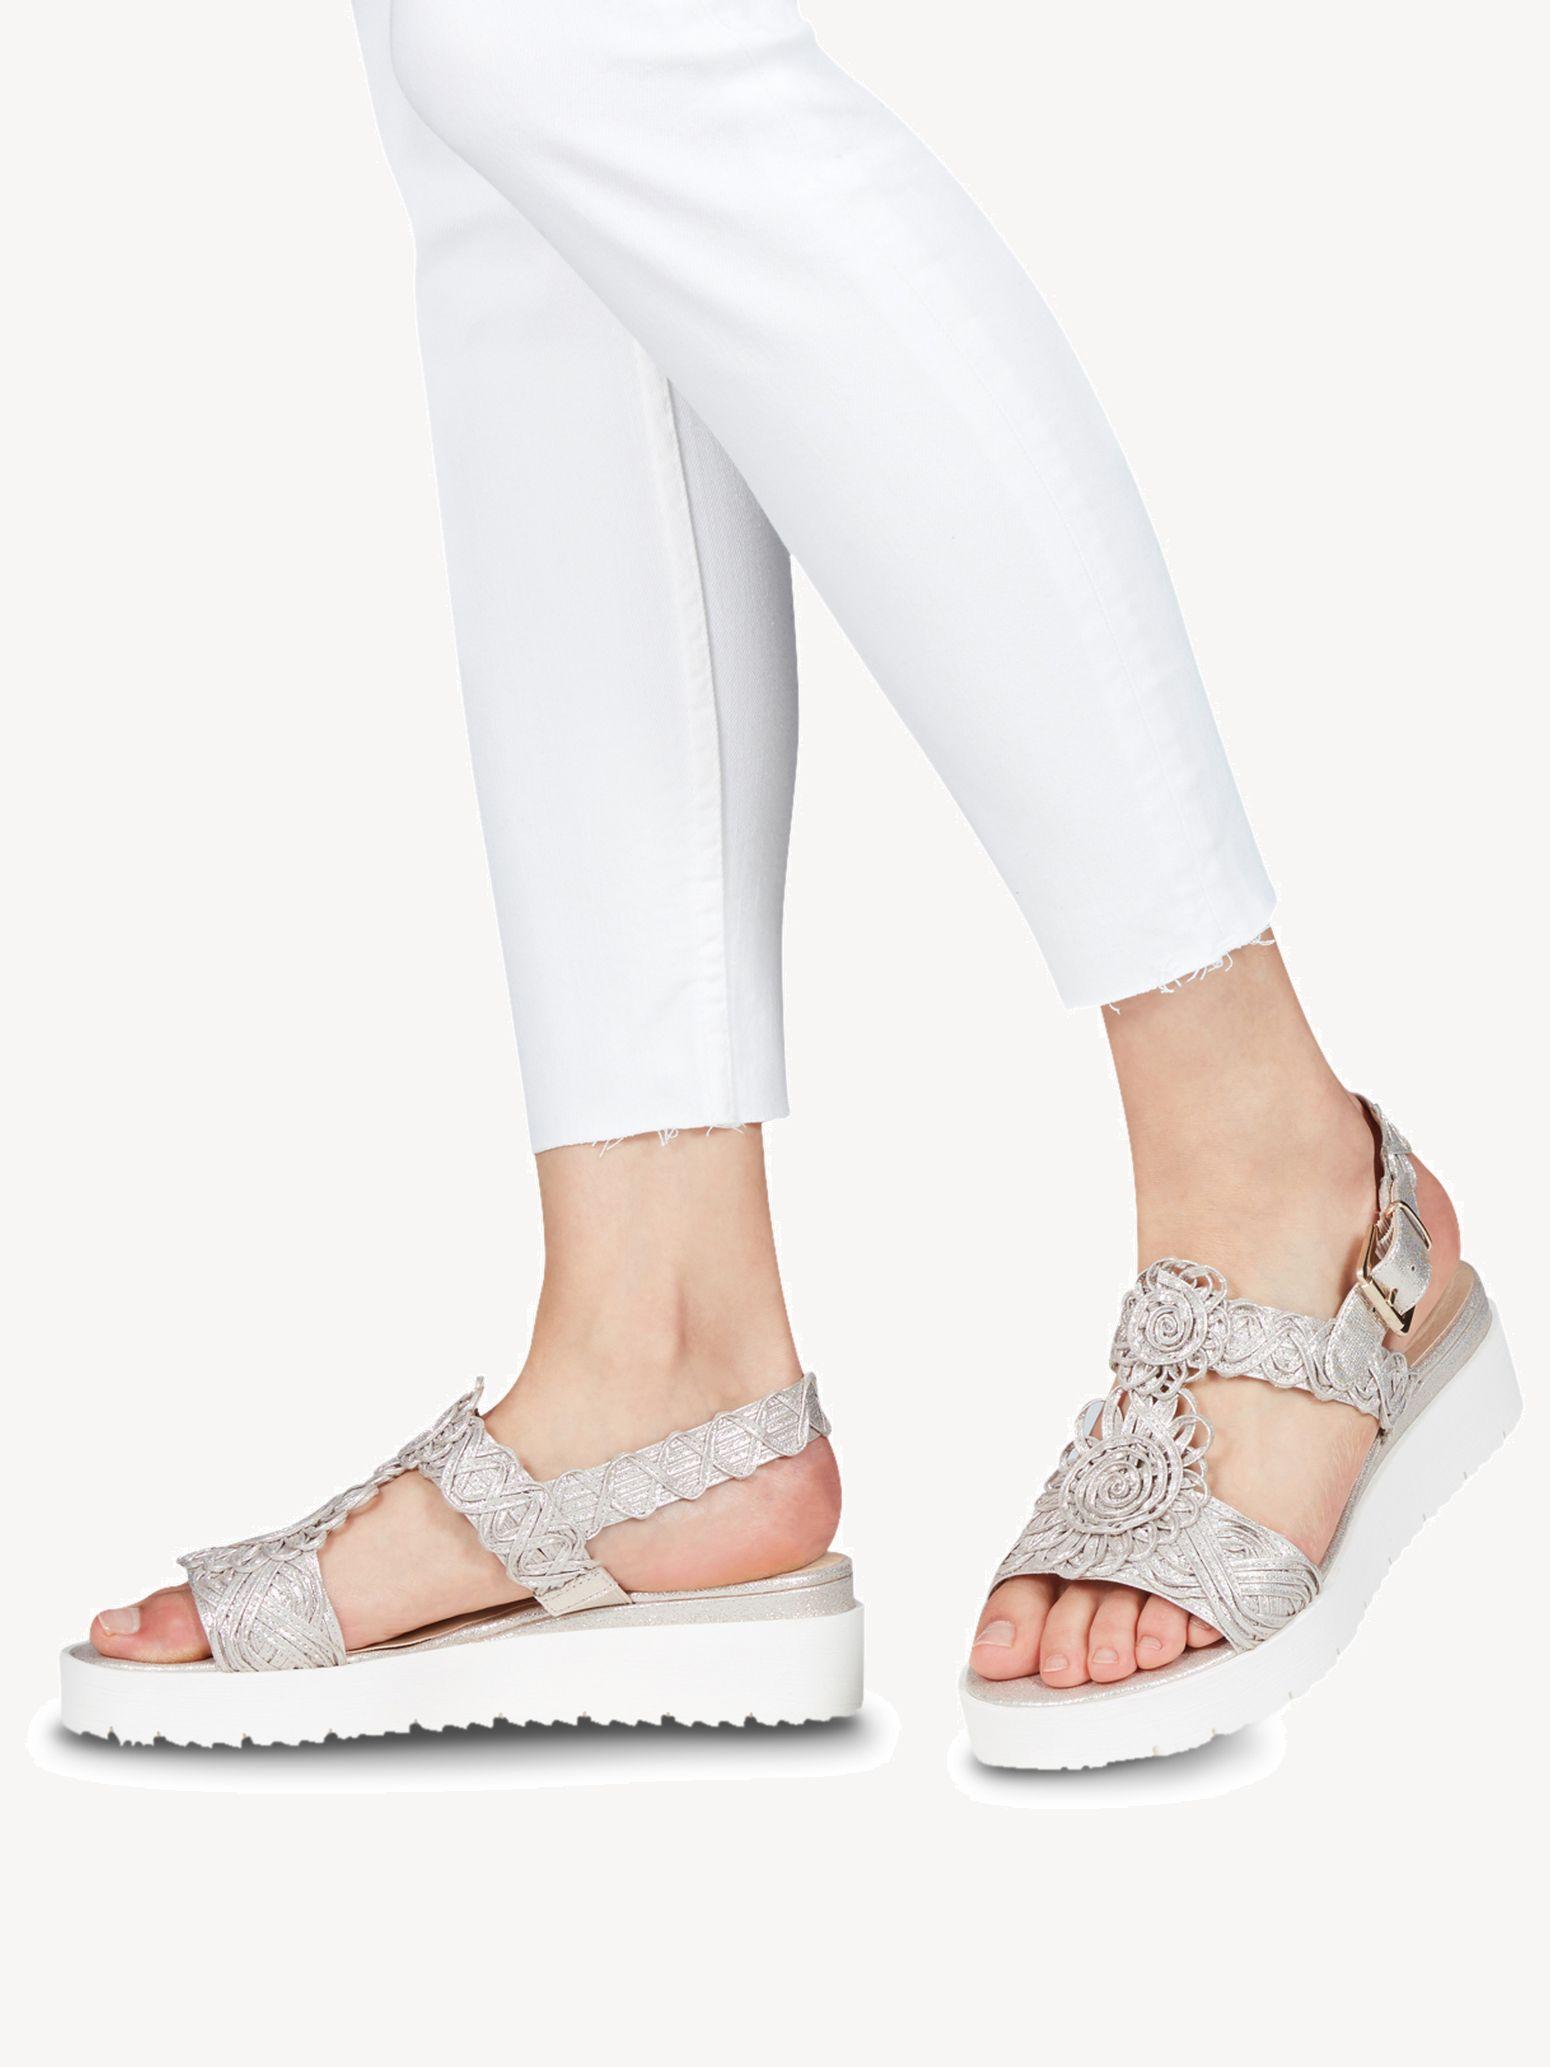 28254 Sandalette 32Tamaris Online 1 Sandaletten 1 Kaufen TlFK1Jc